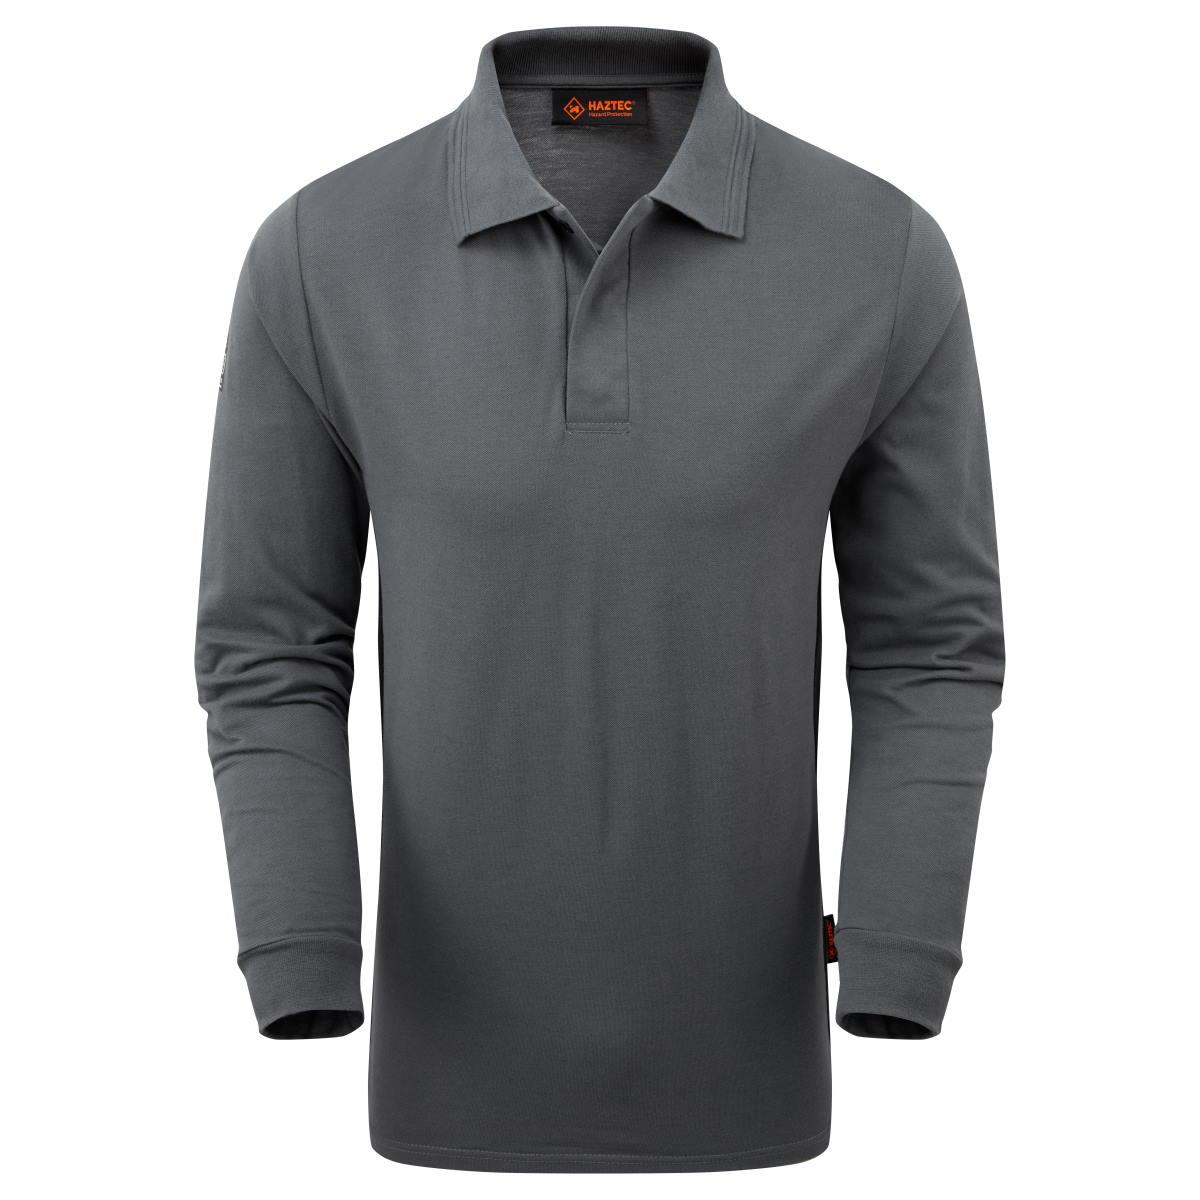 AS2242_HAZTEC Carrac FR AS Inherent Polo_Grey-Black